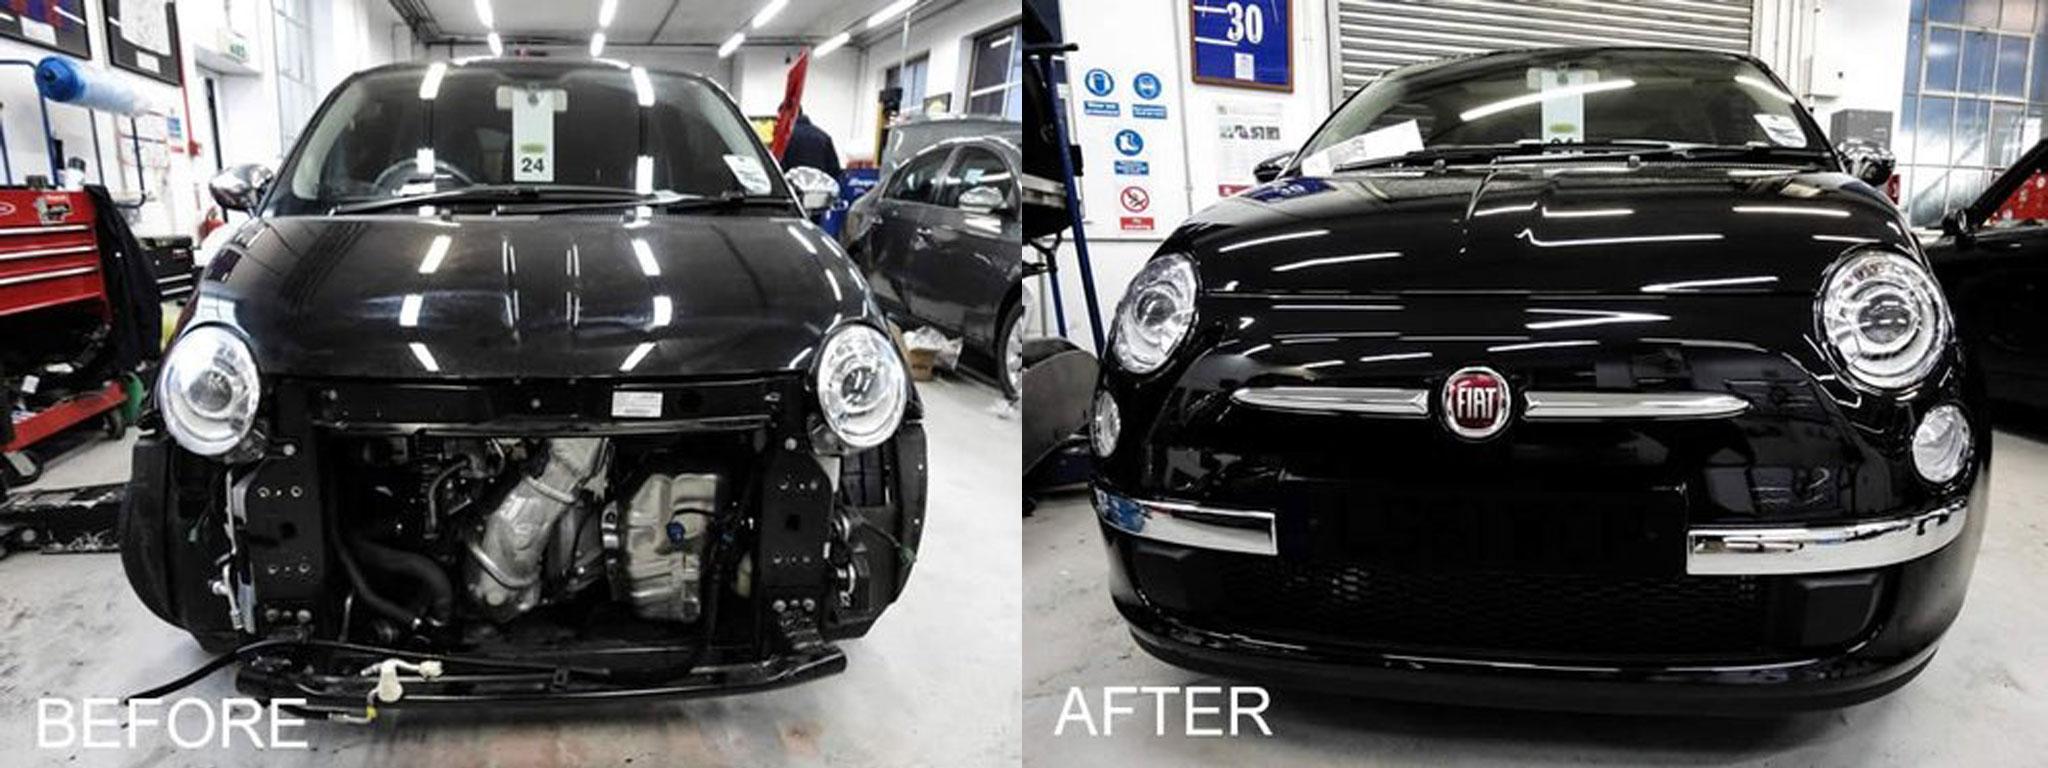 Fiat bumper repair